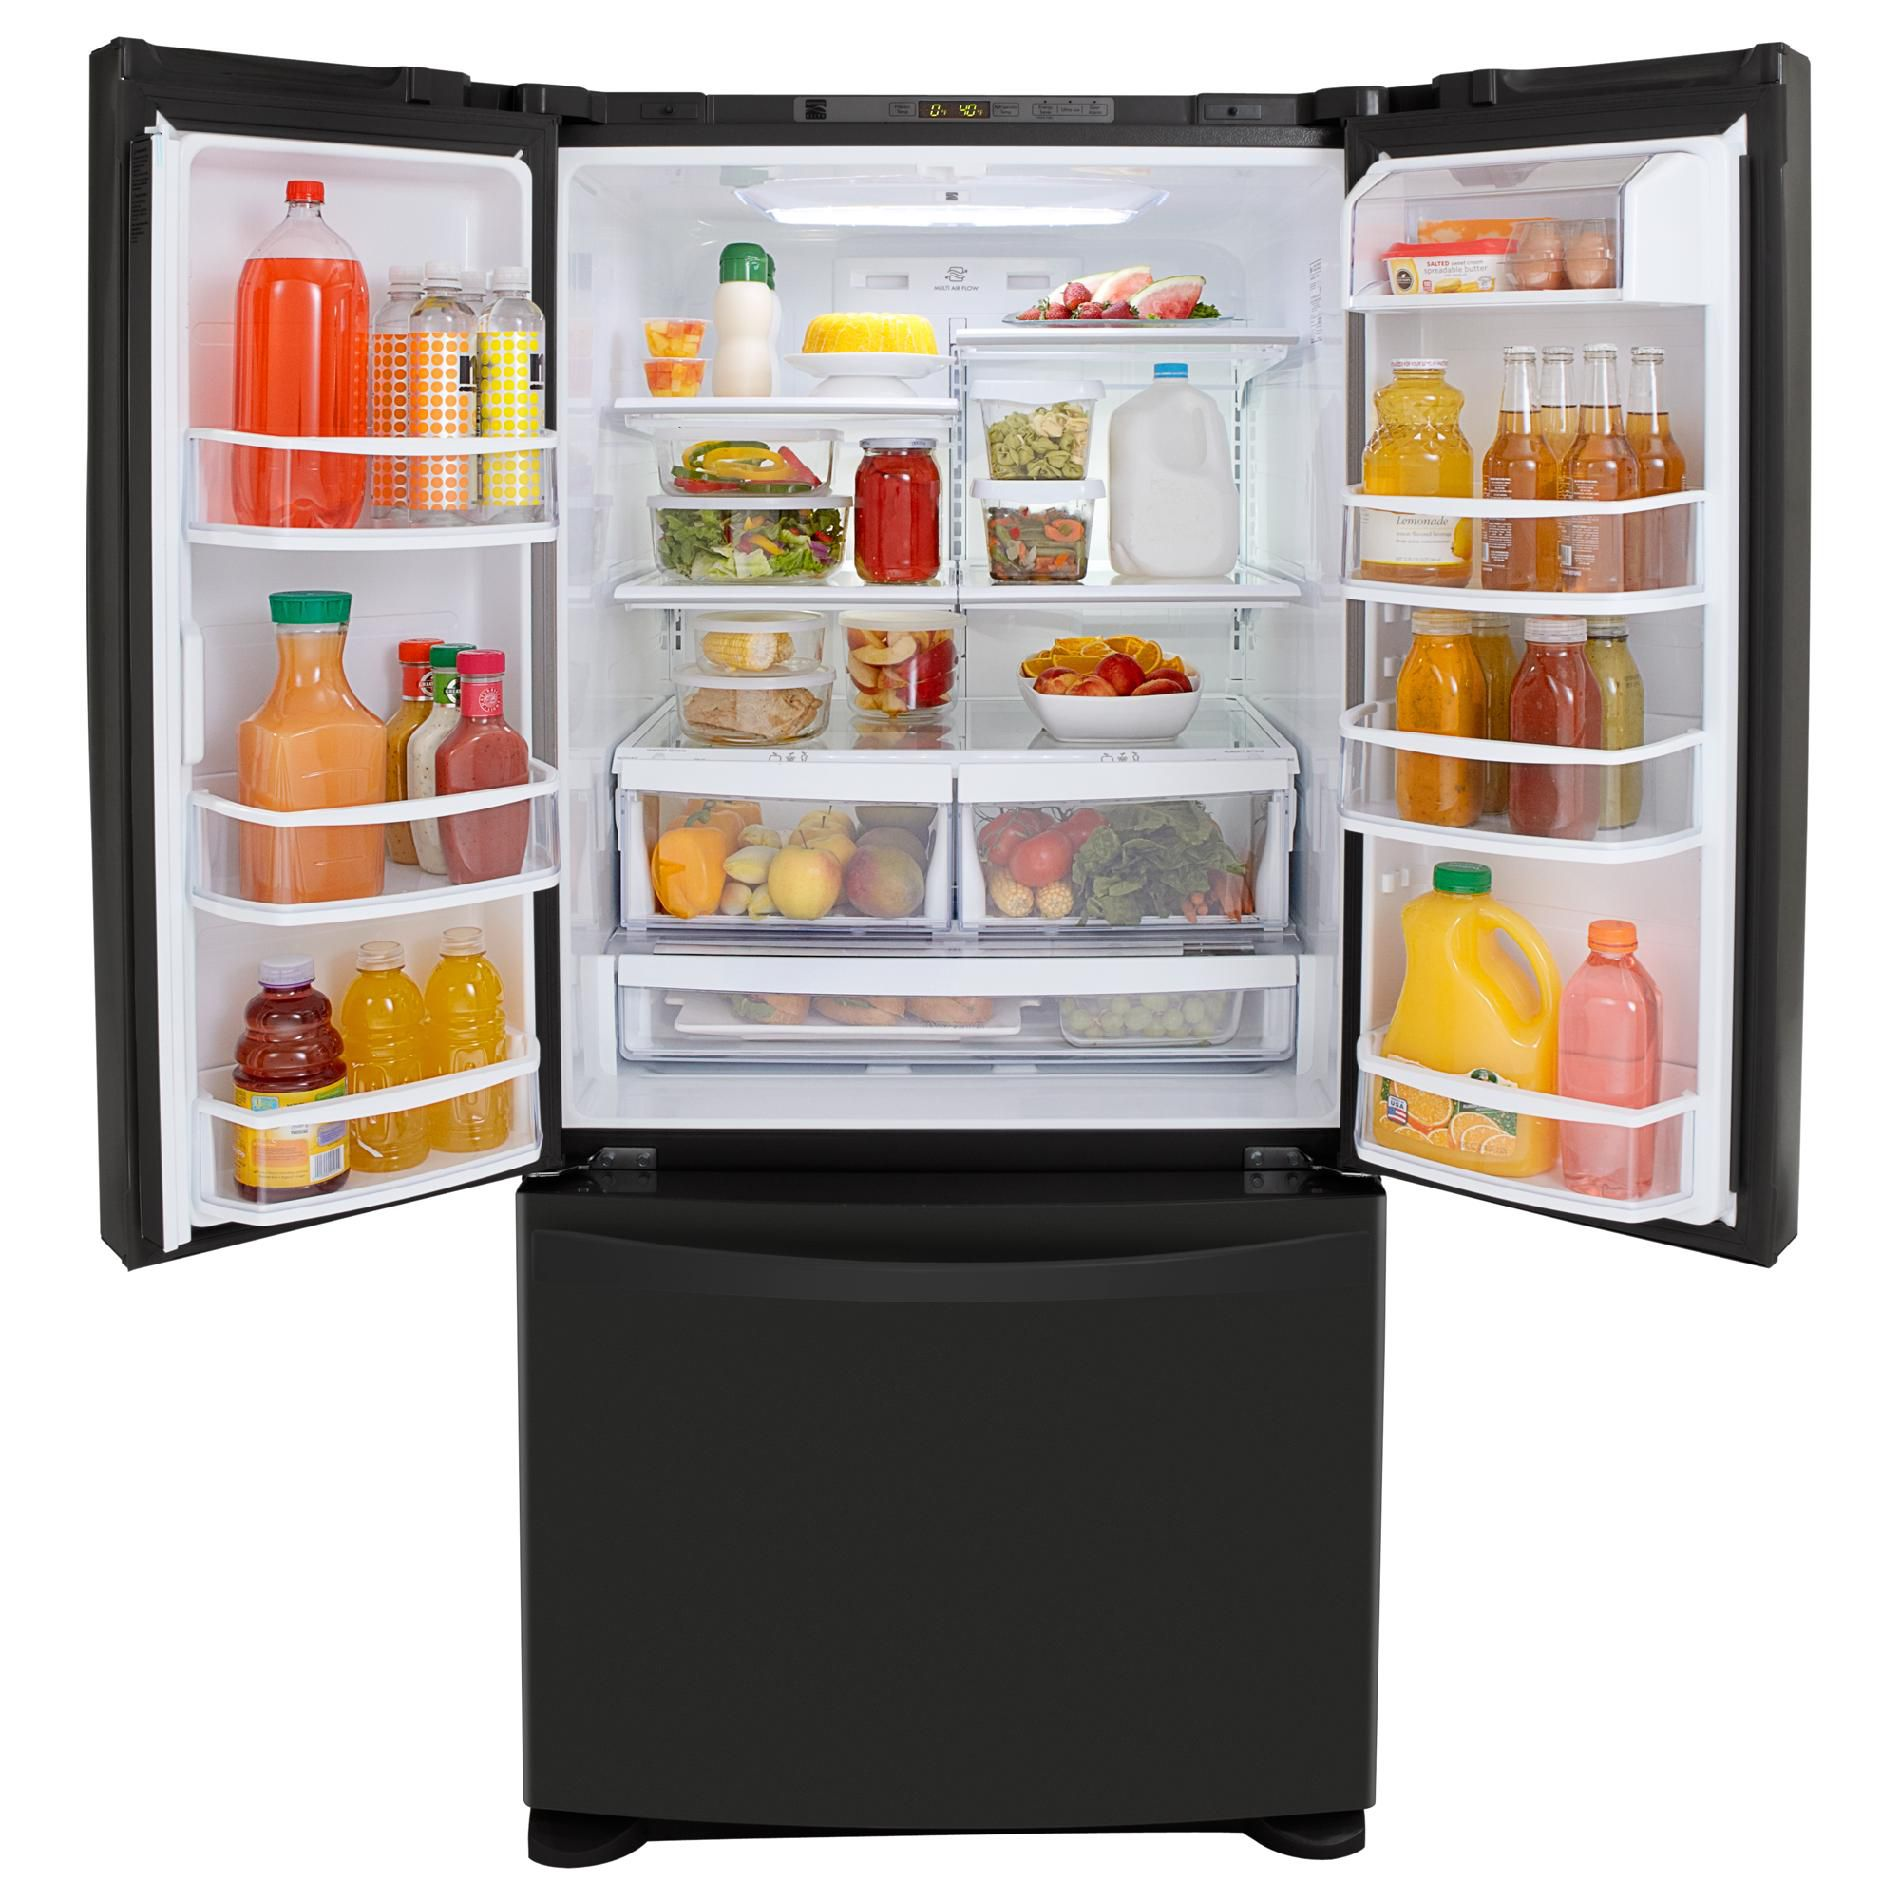 Kenmore Elite 25 cu. ft. French-Door Bottom-Freezer Refrigerator Non-Dispenser - Black